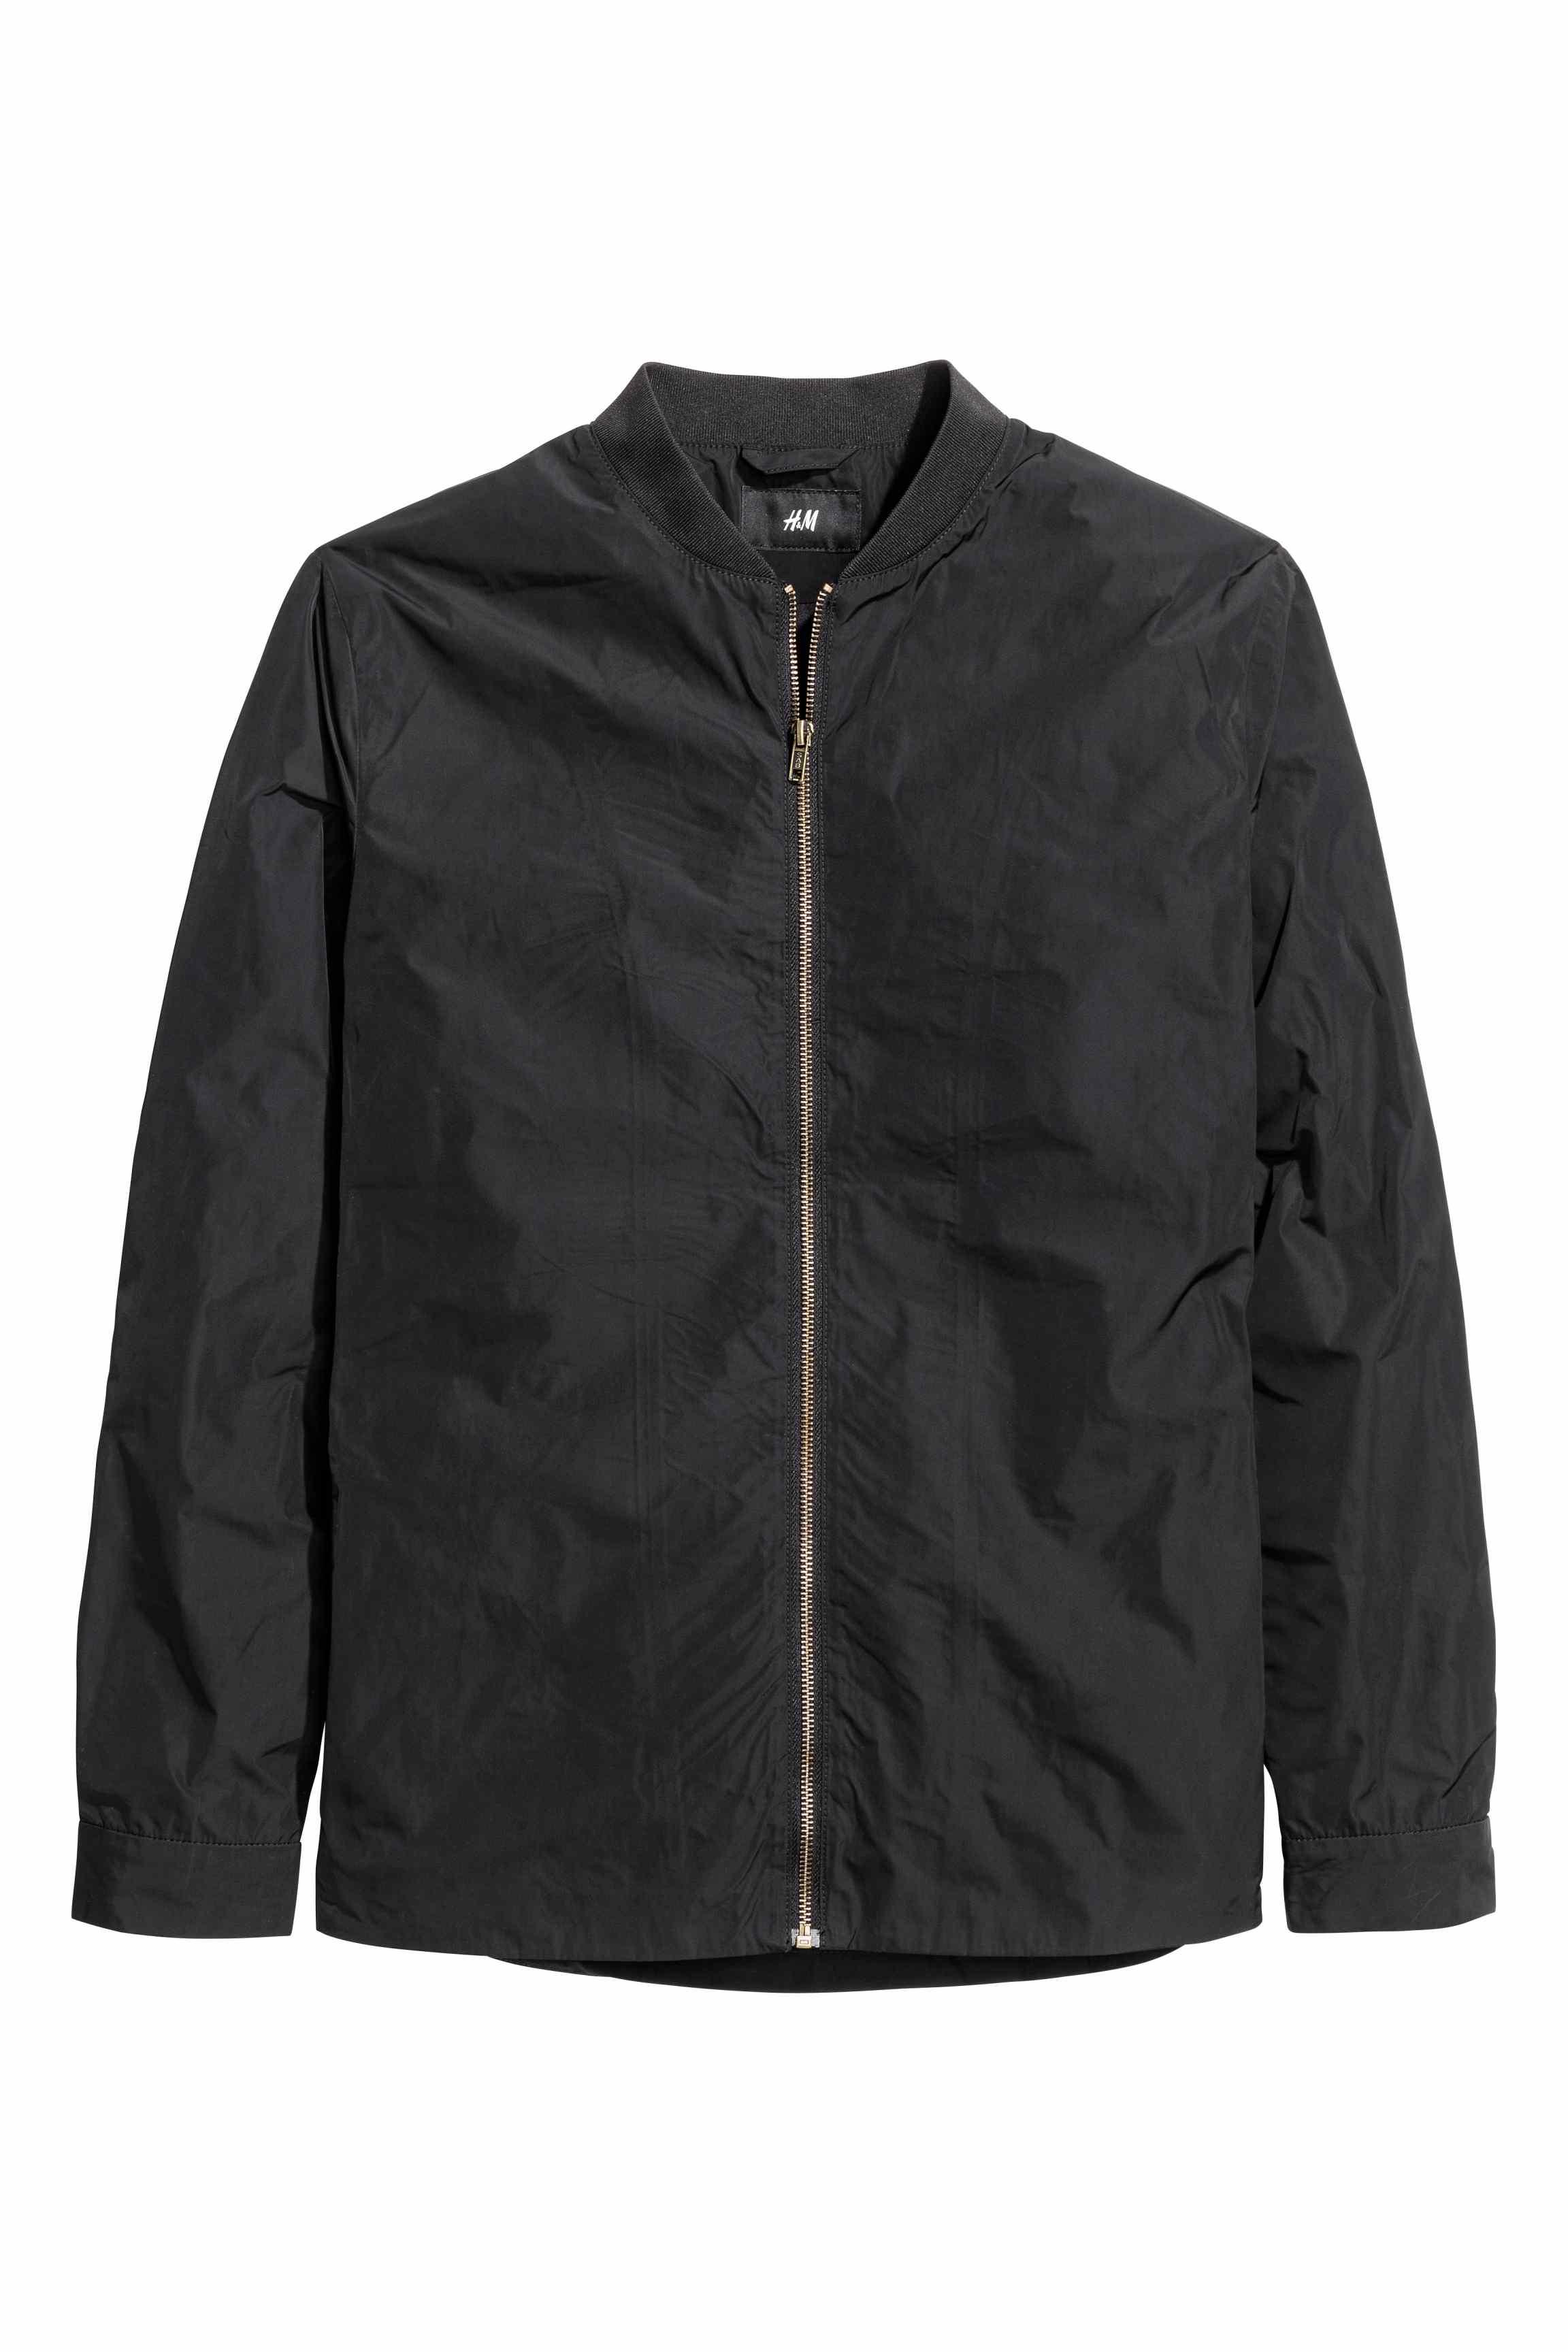 Hu0026m Bomber Jacket In Black For Men | Lyst